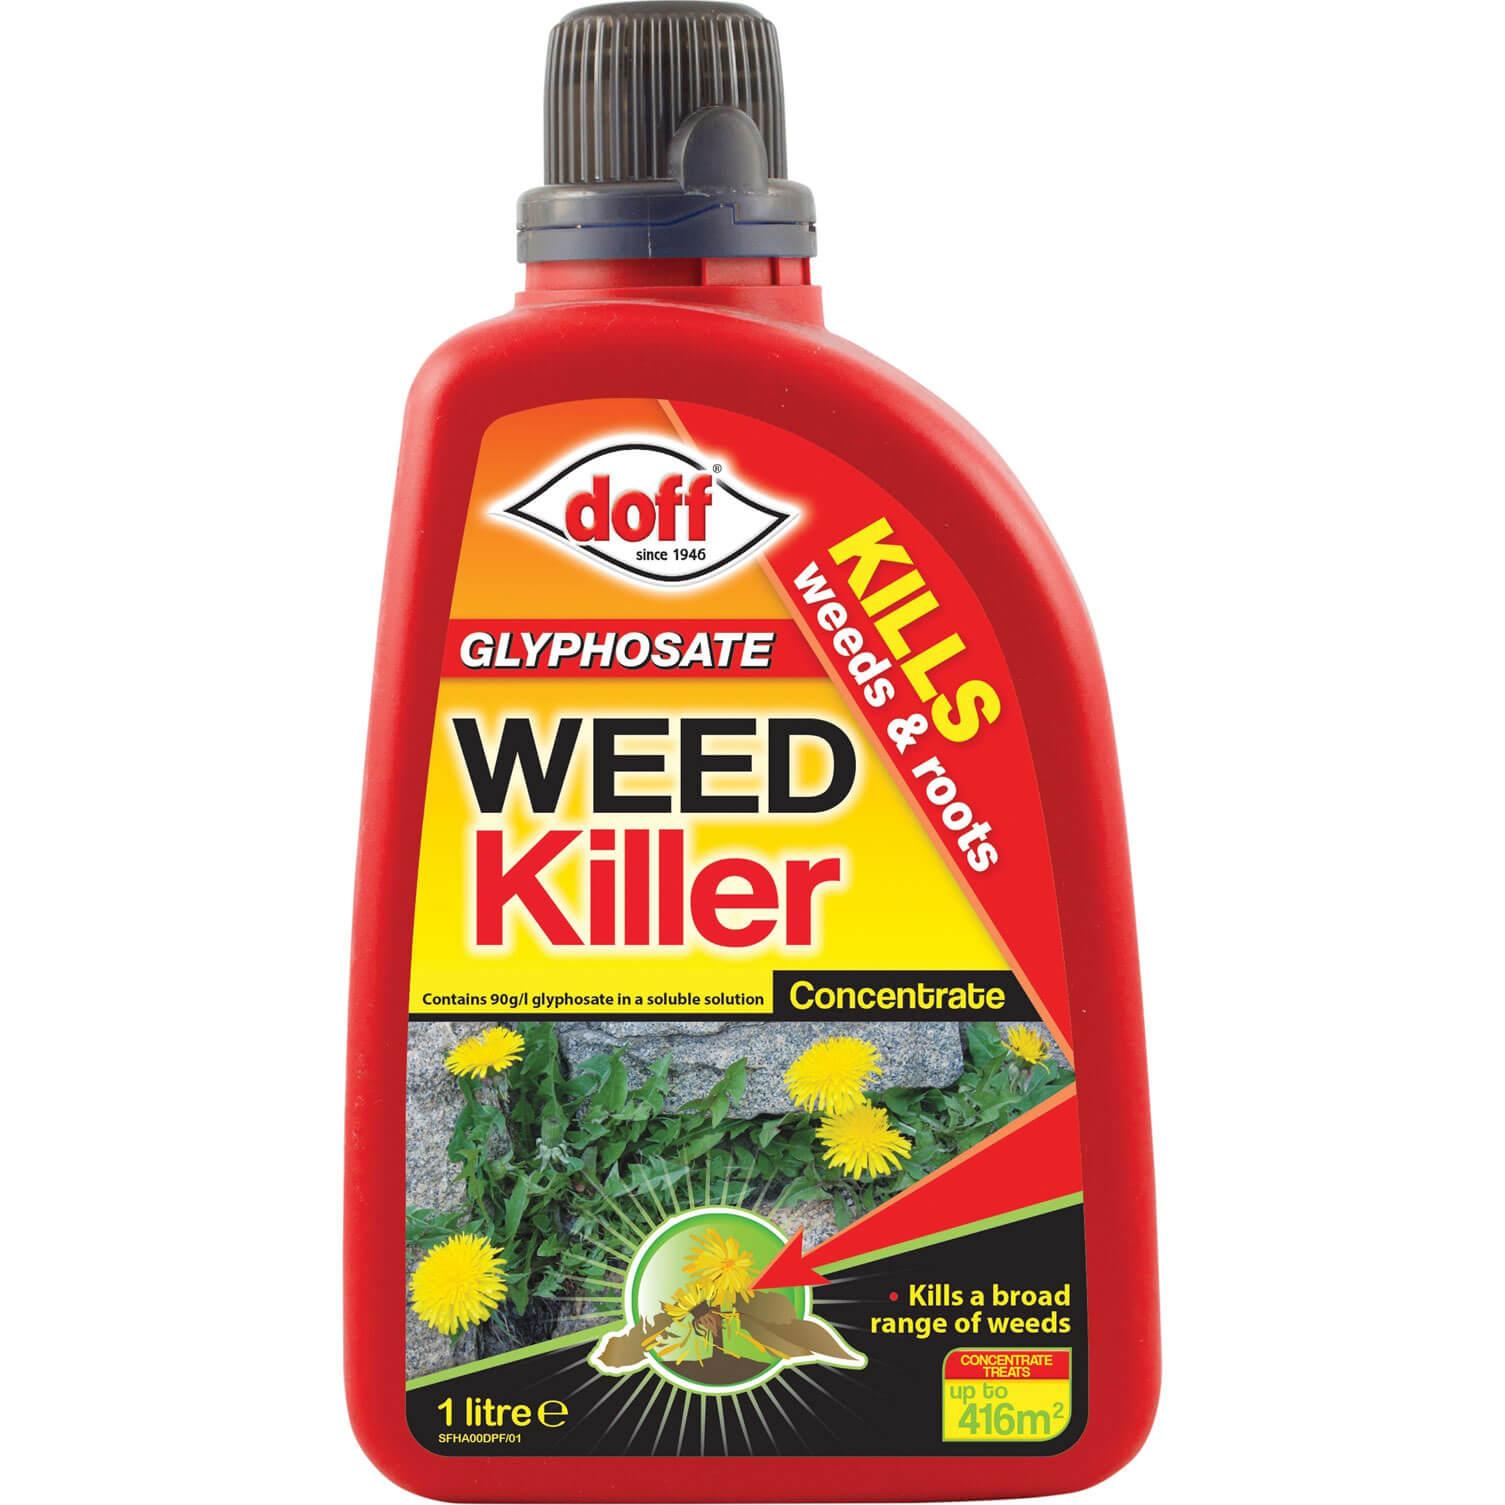 Image of Doff Glyphosate Weedkiller Concentrate 1L